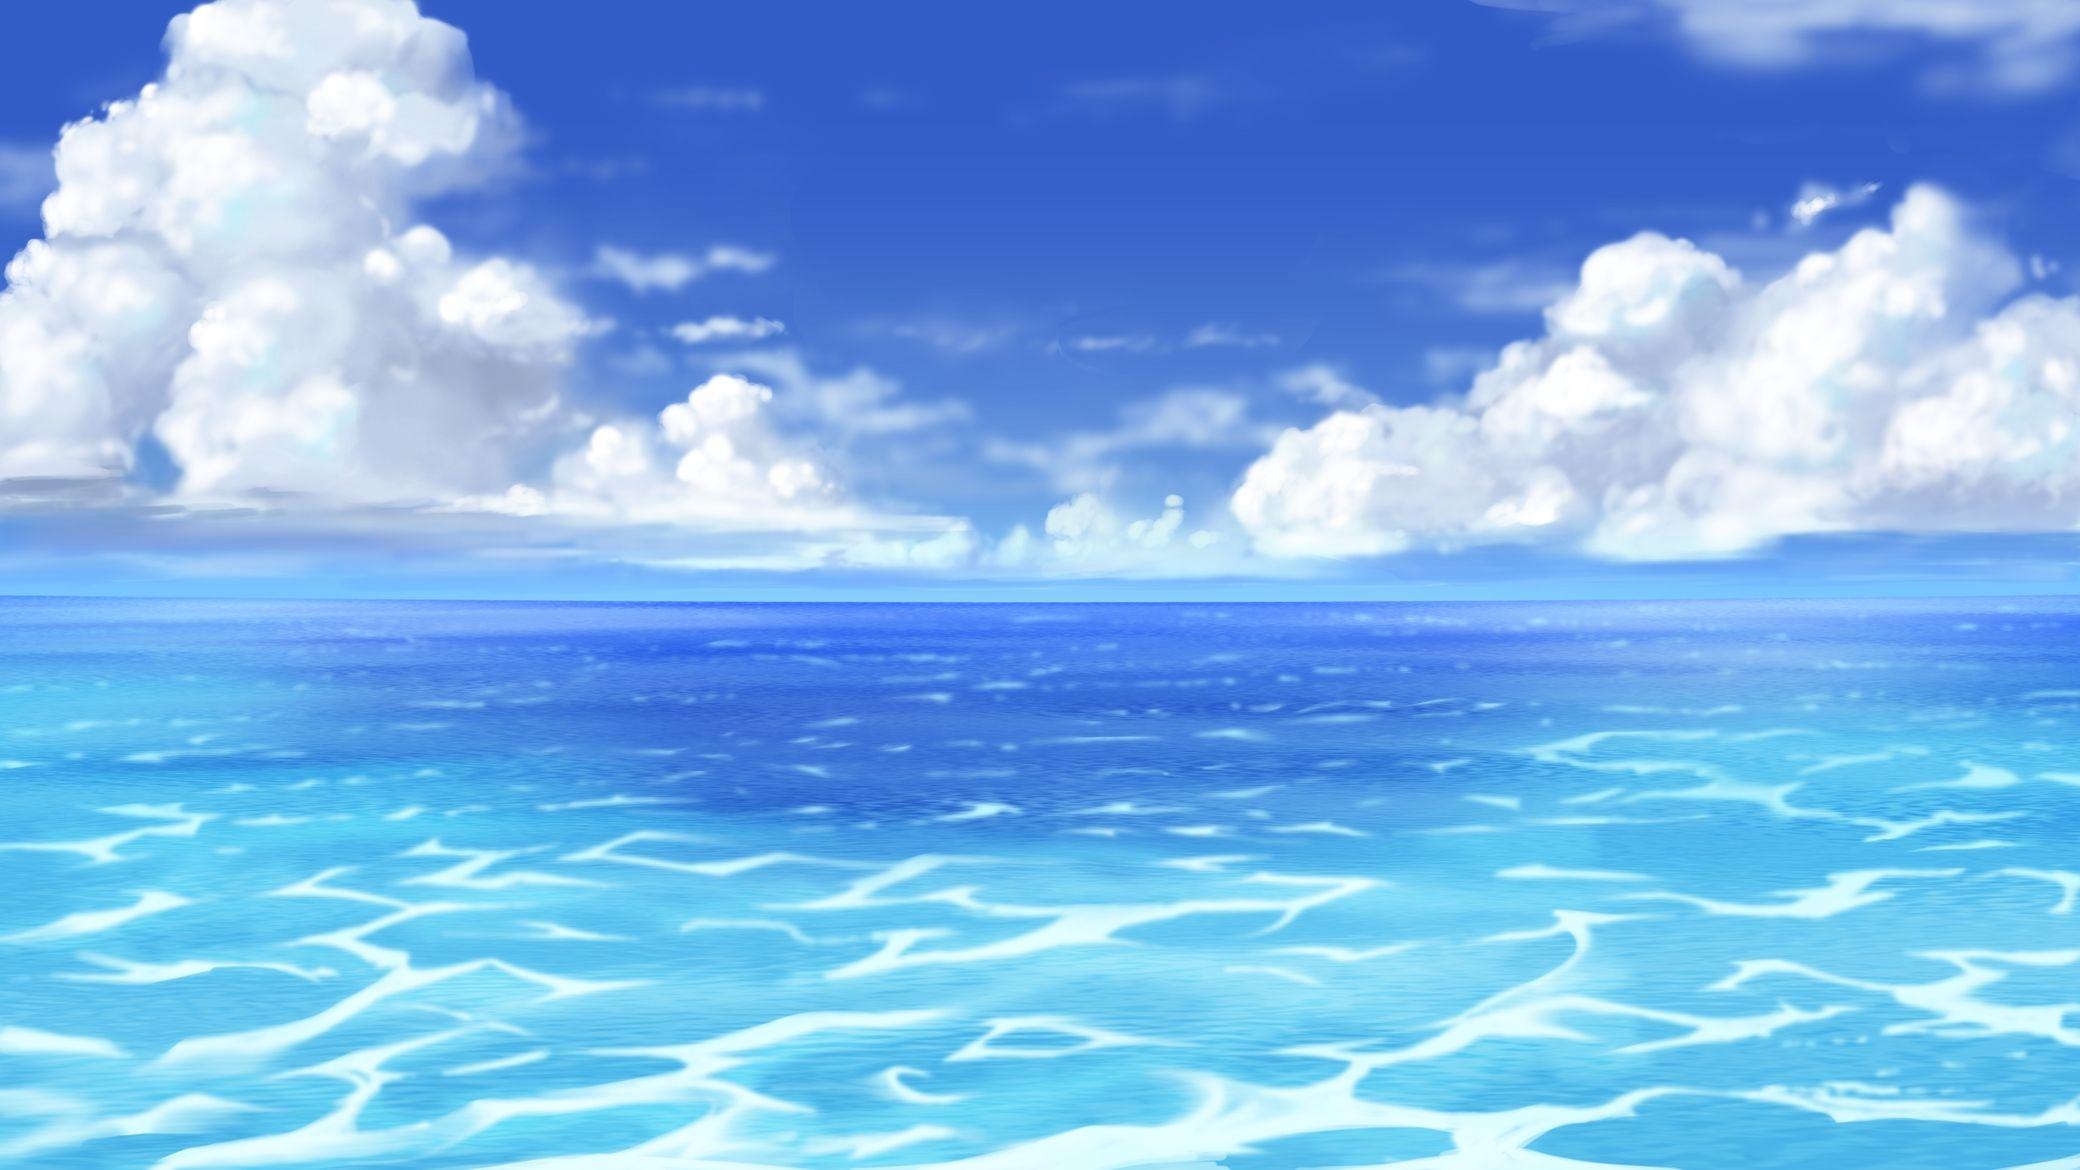 Výsledek obrázku pro anime sea